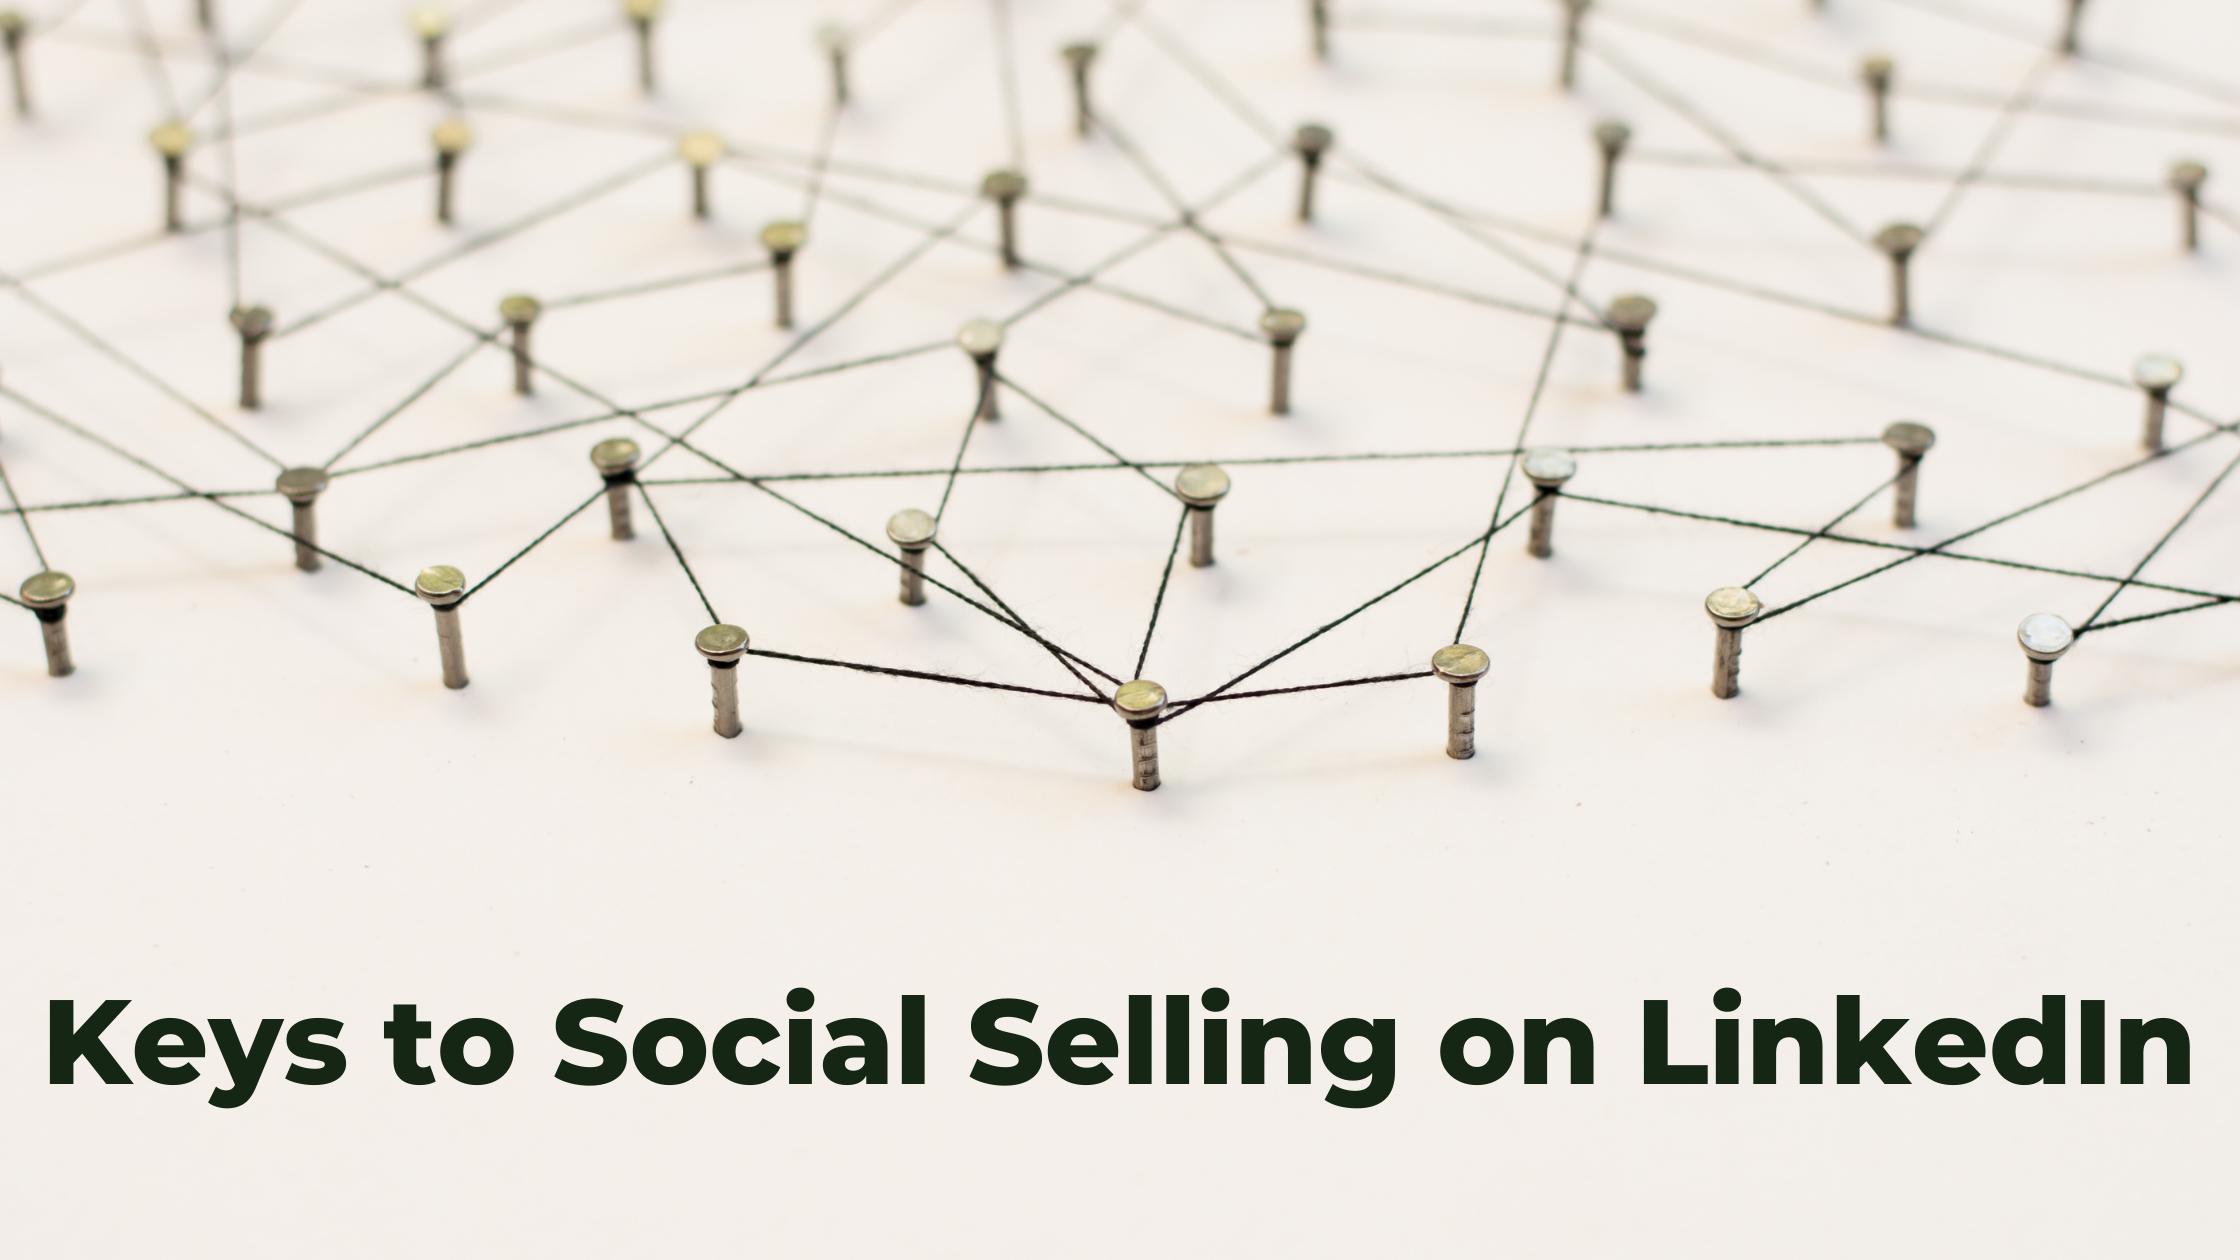 Keys to Social Selling on LinkedIn